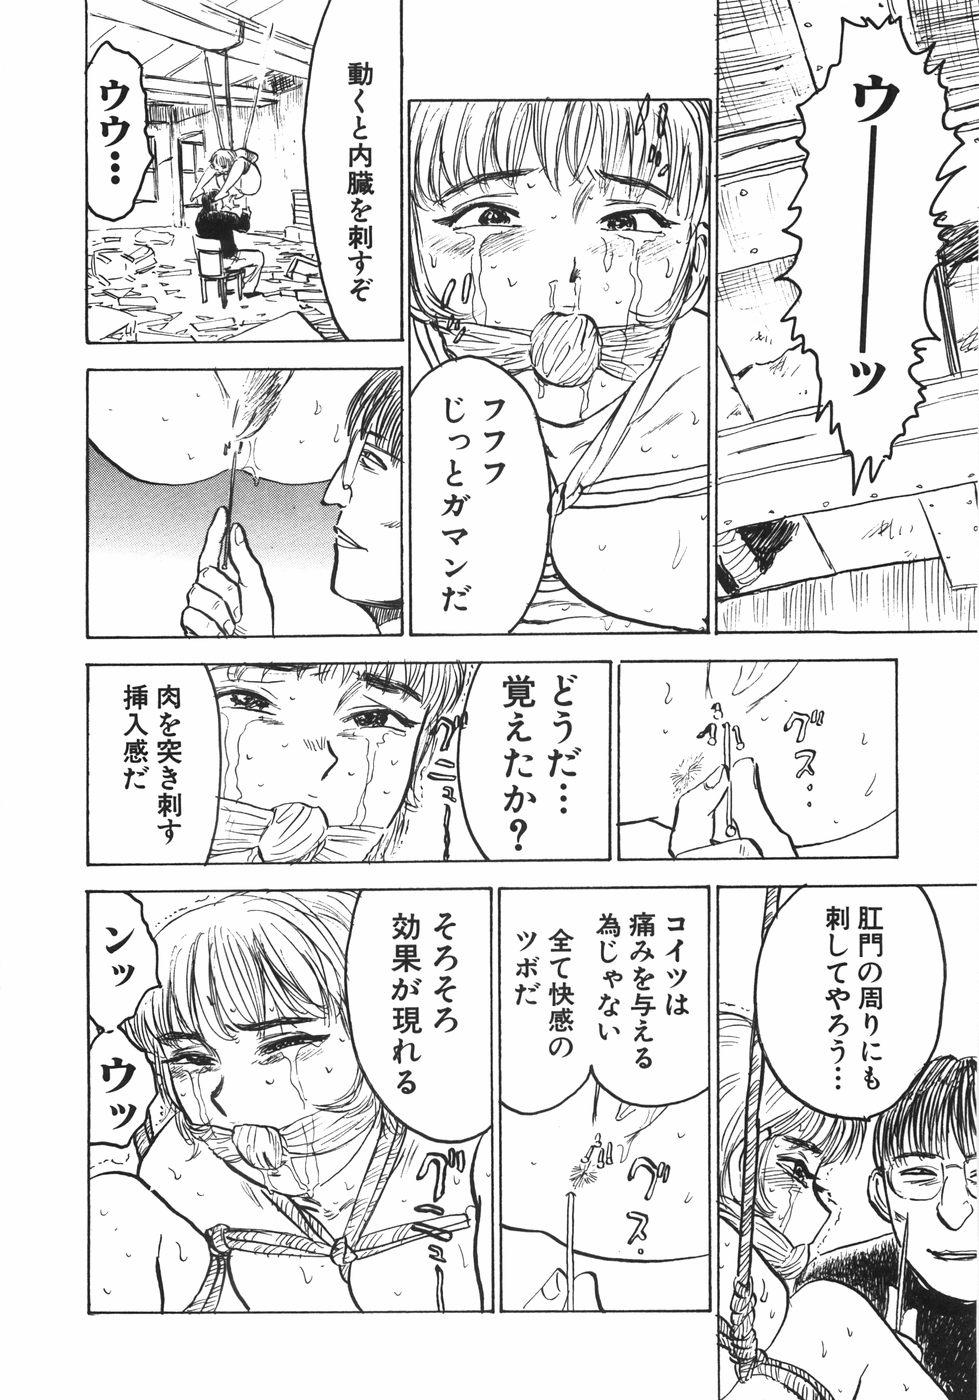 Ningyou no Yakata - The Doll House 118